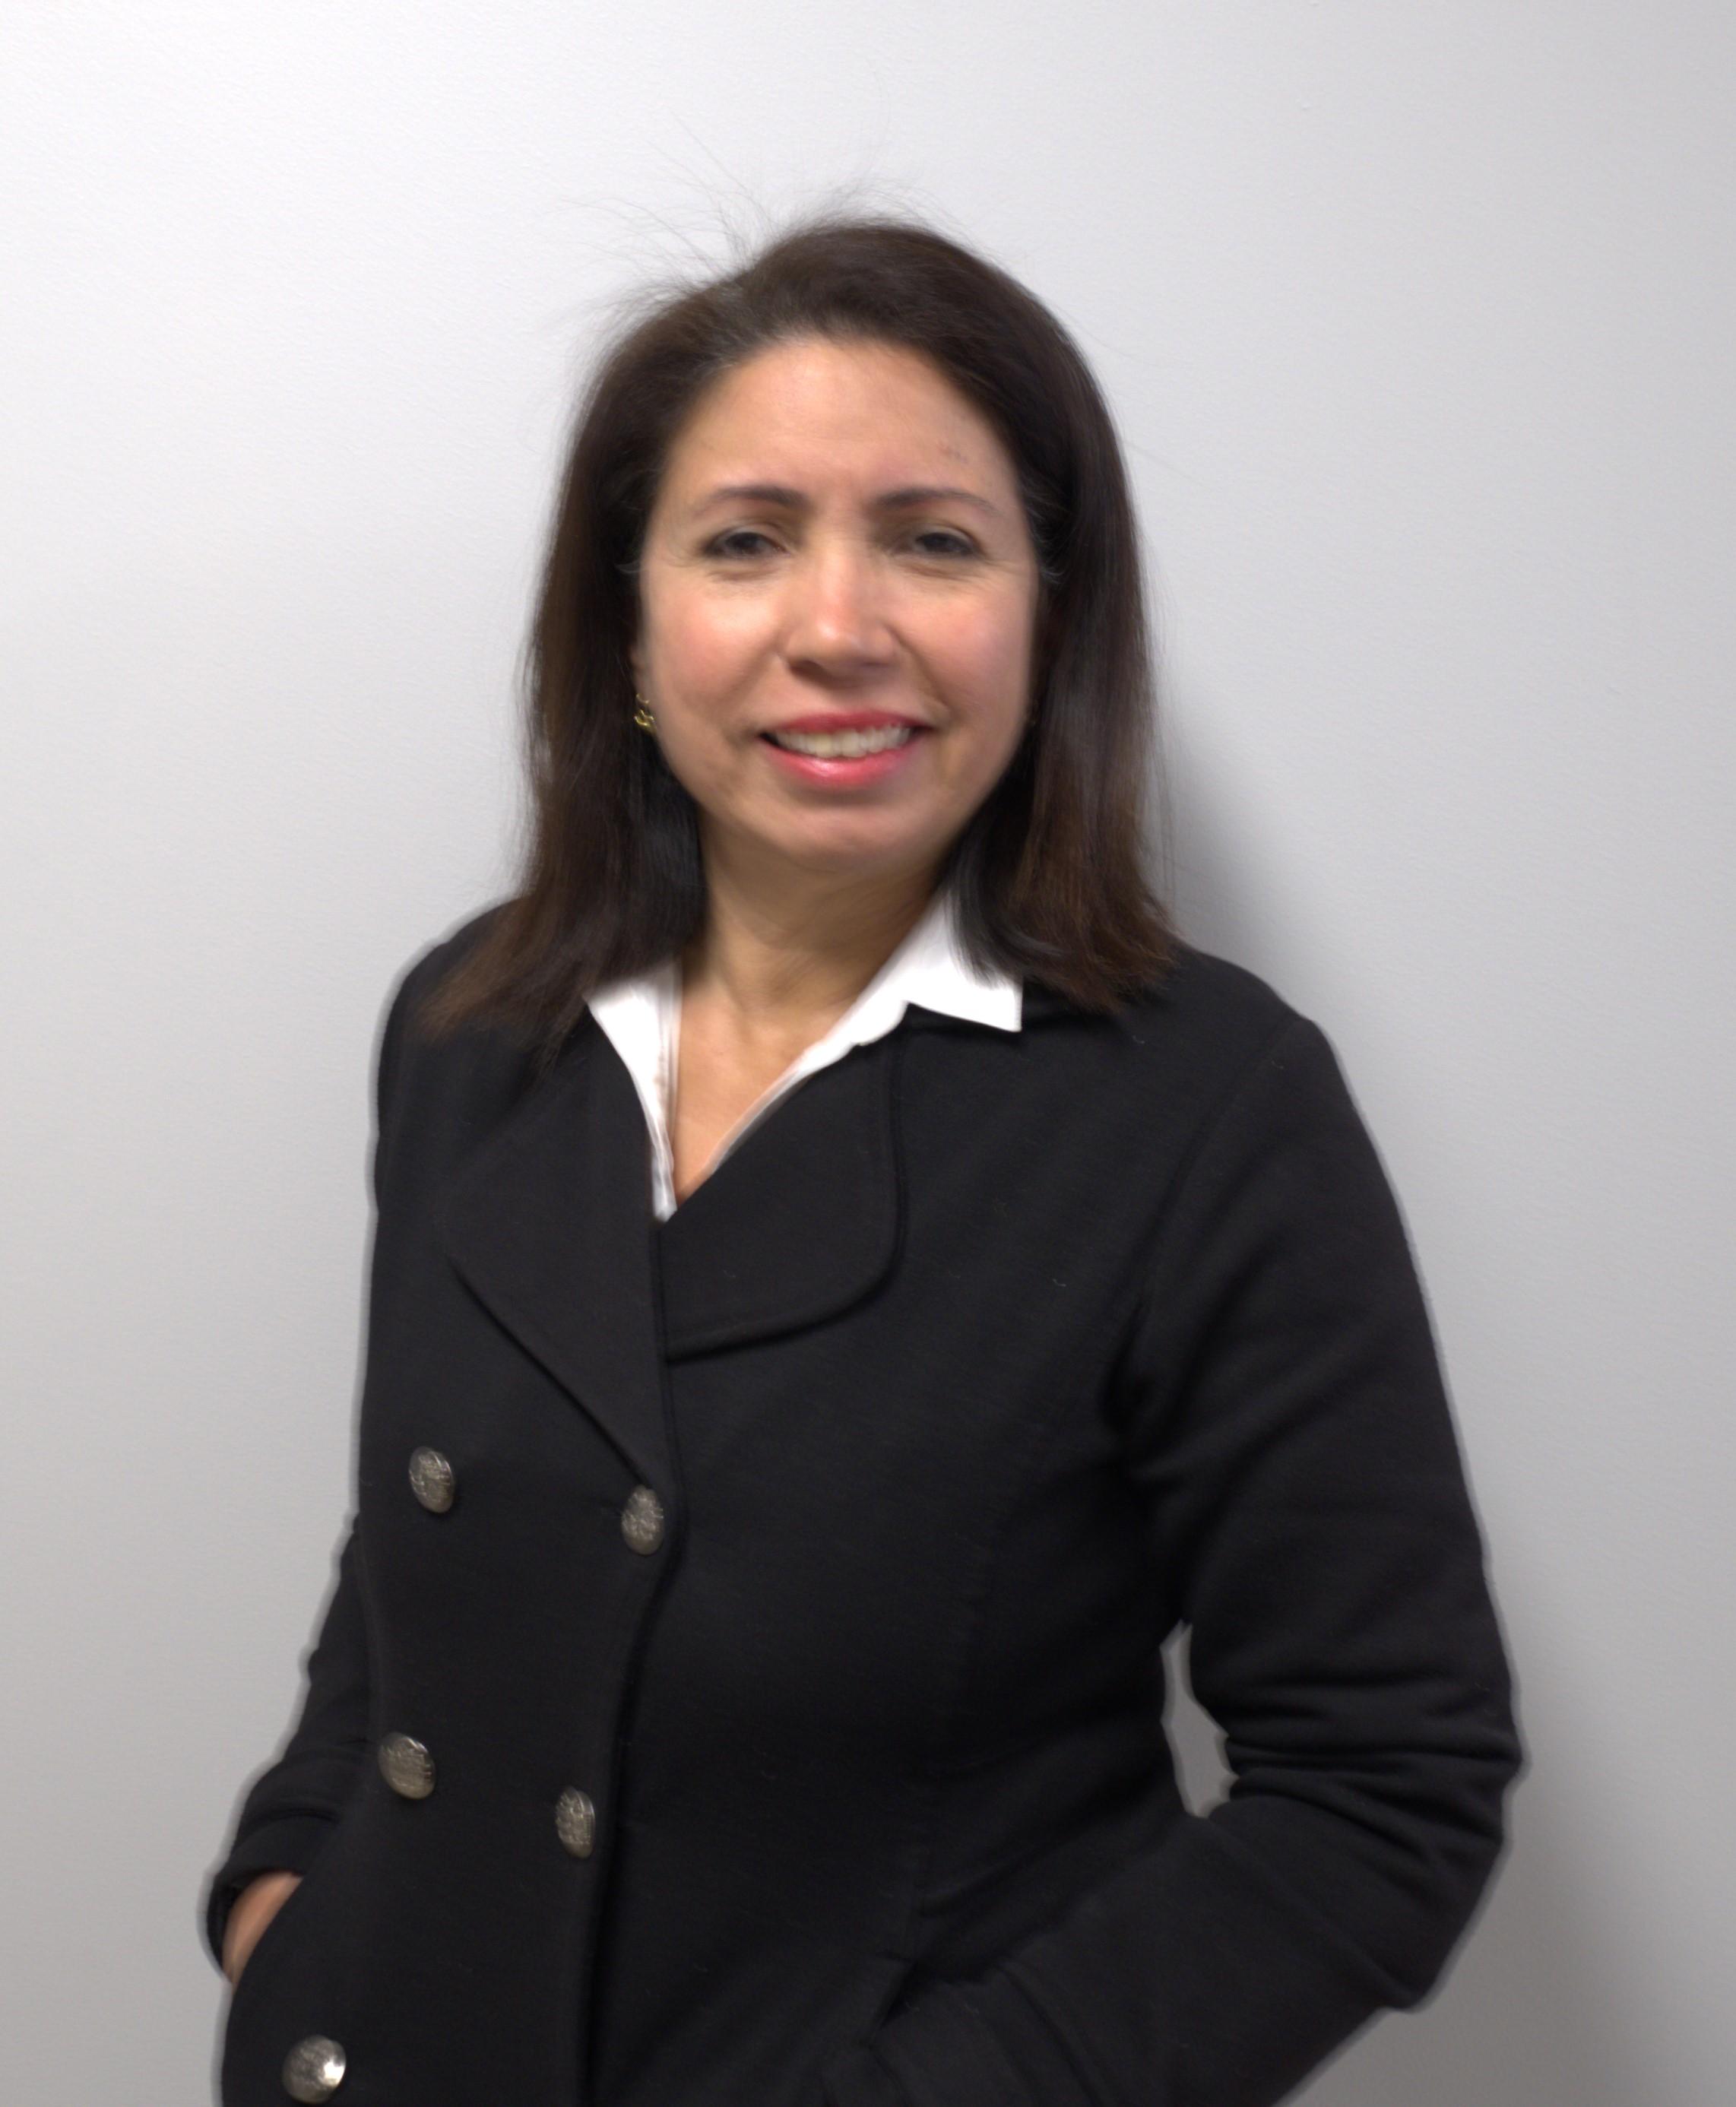 Denise Barros